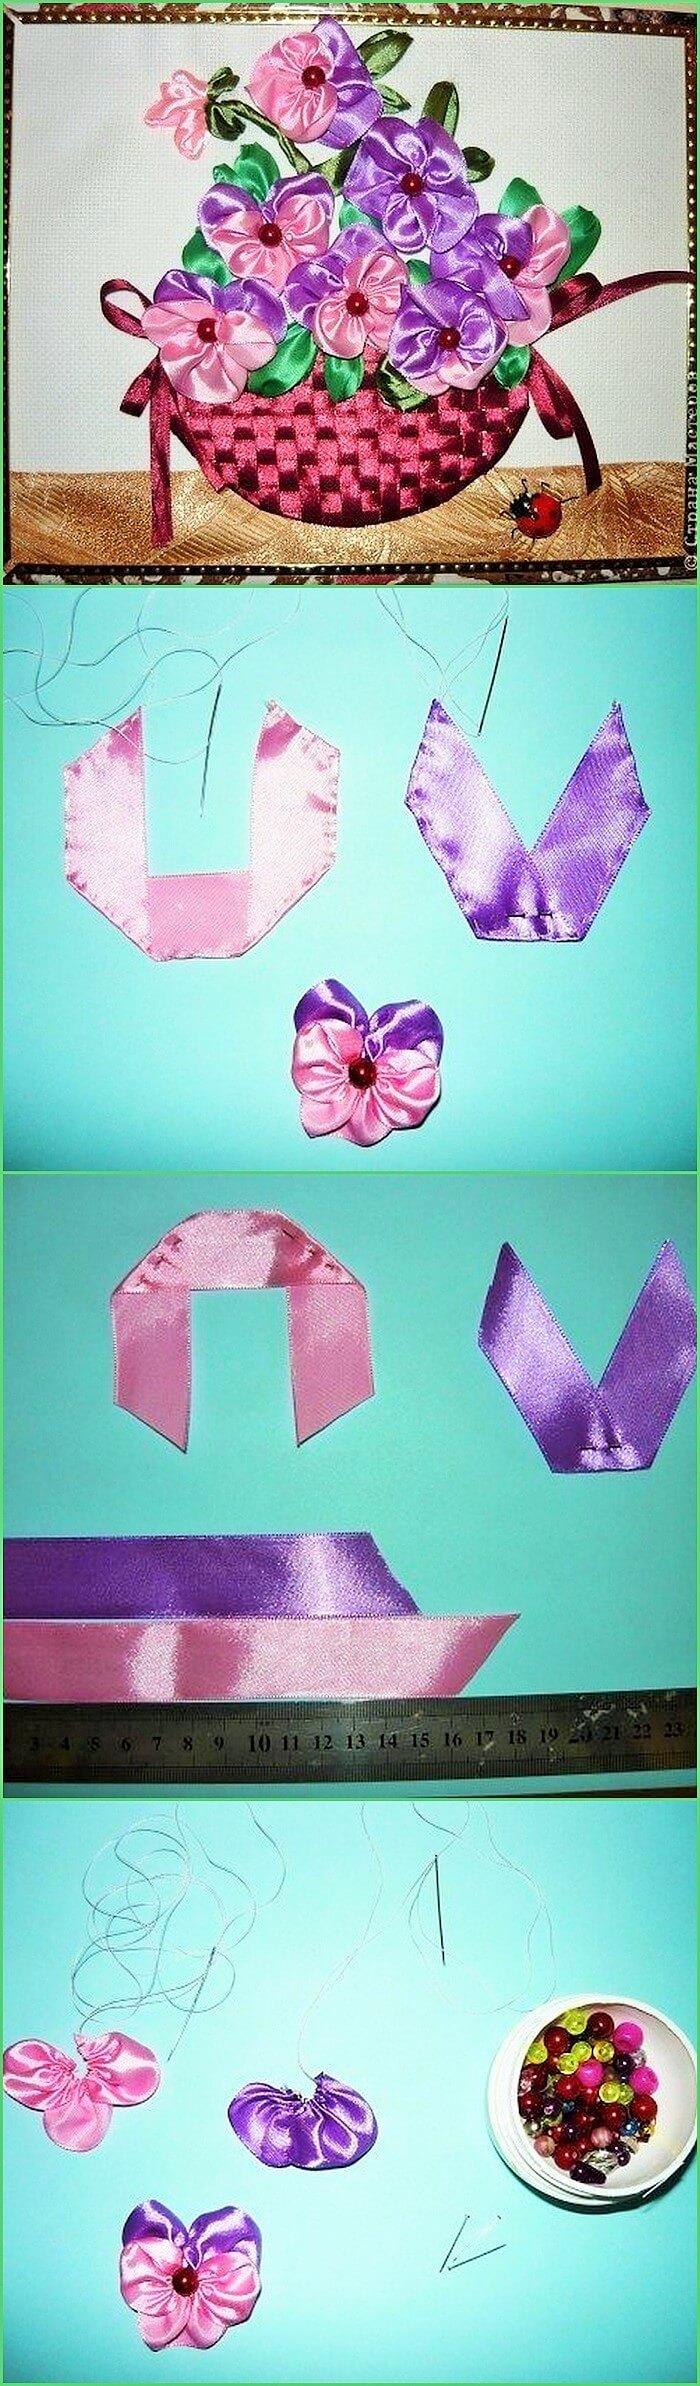 Homemade crafts Ideas-4